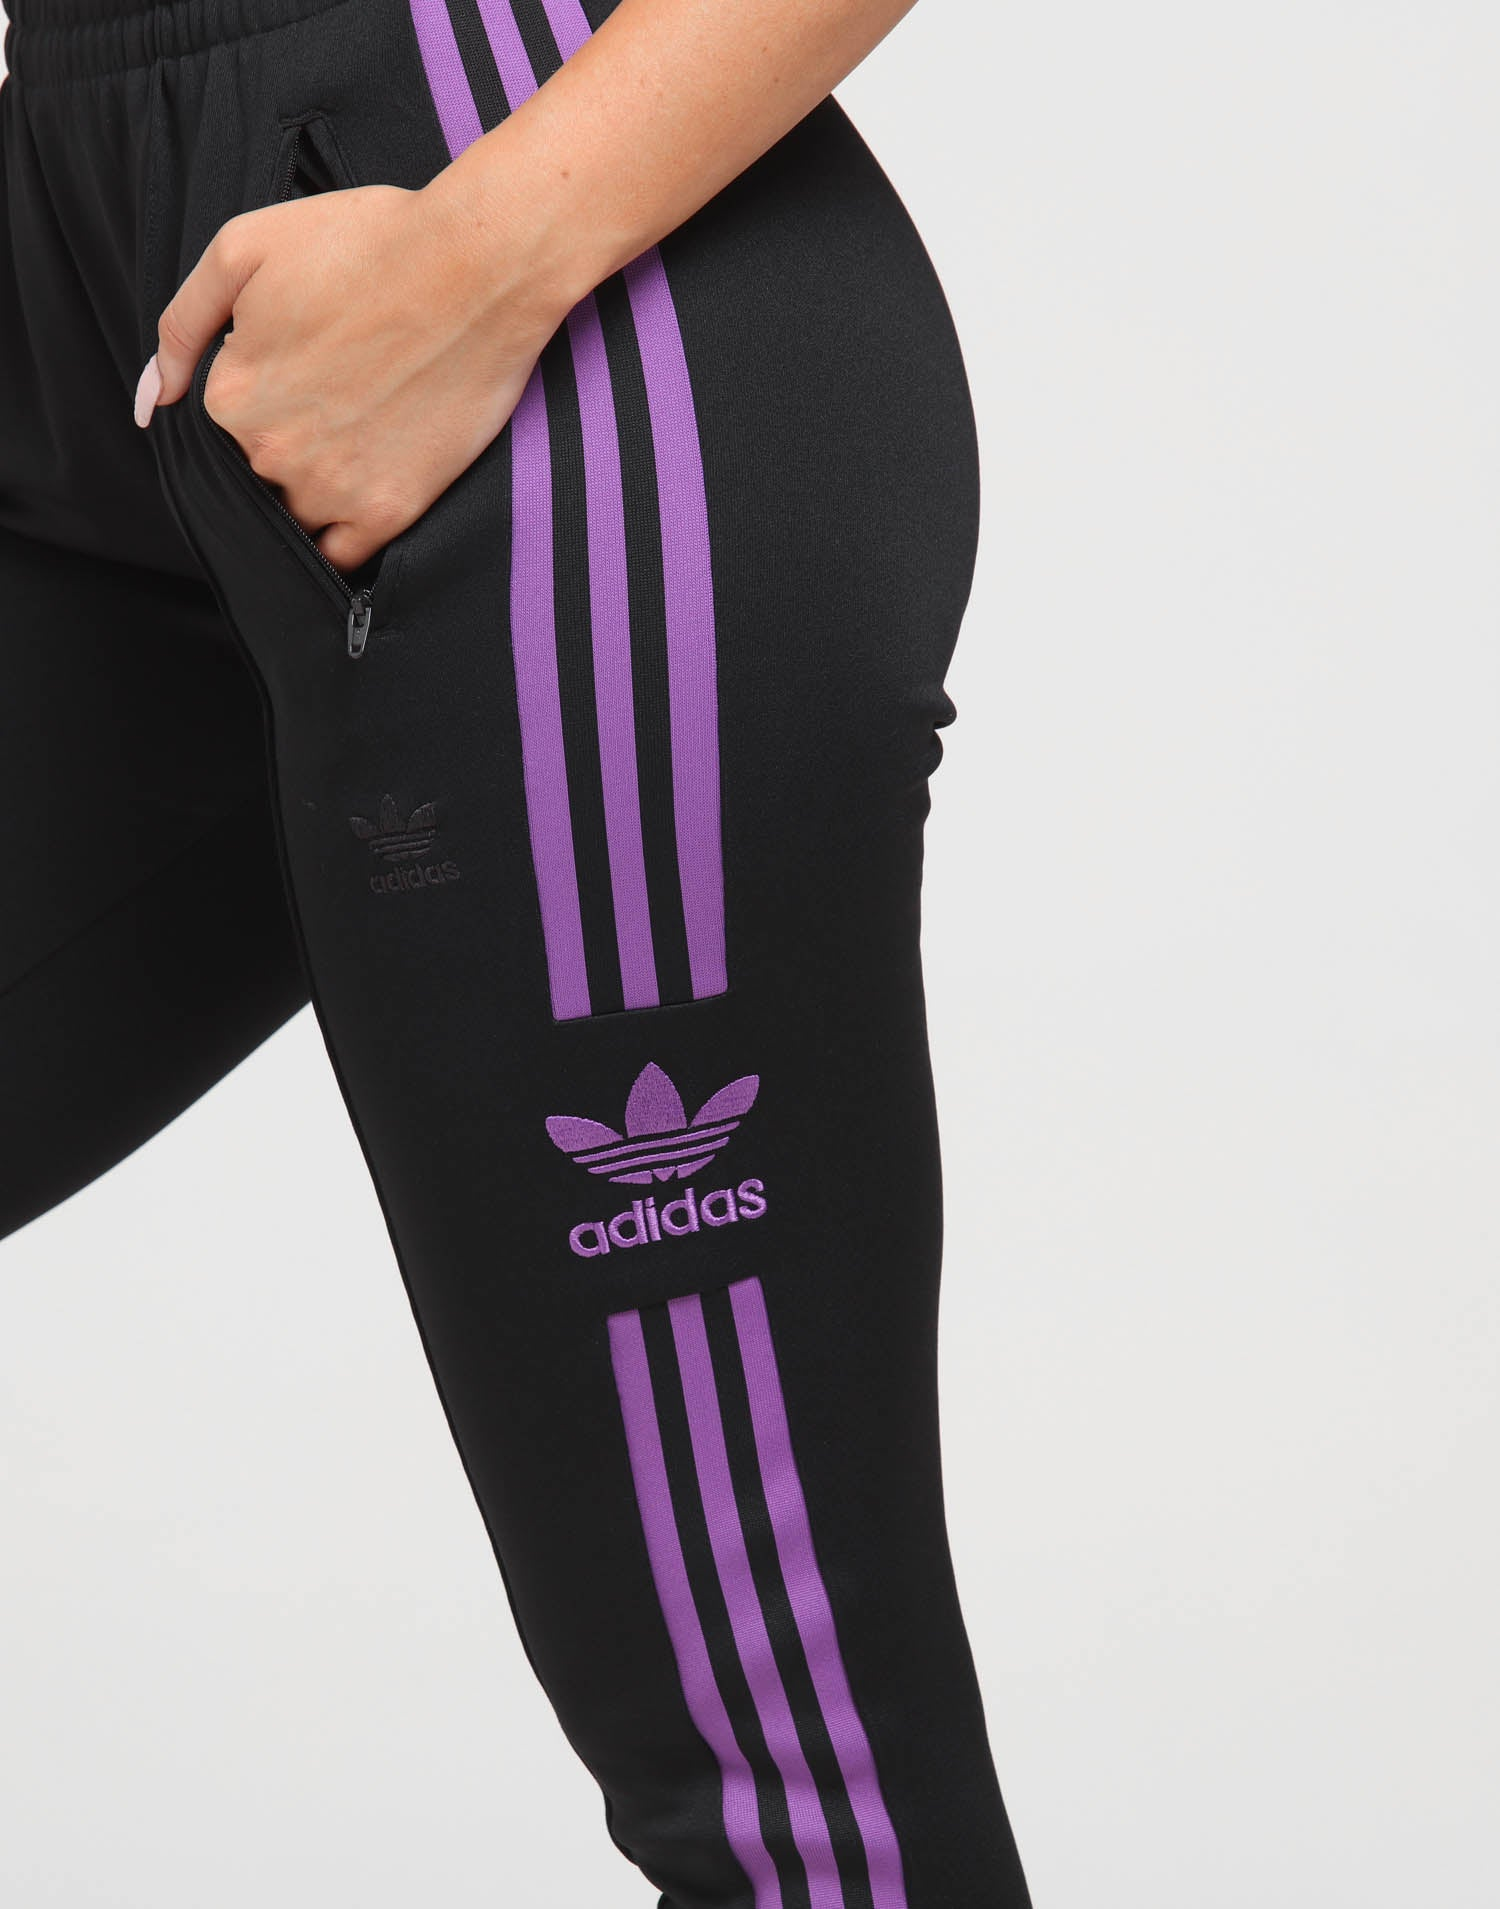 Adidas Women's SST Track Pants Black